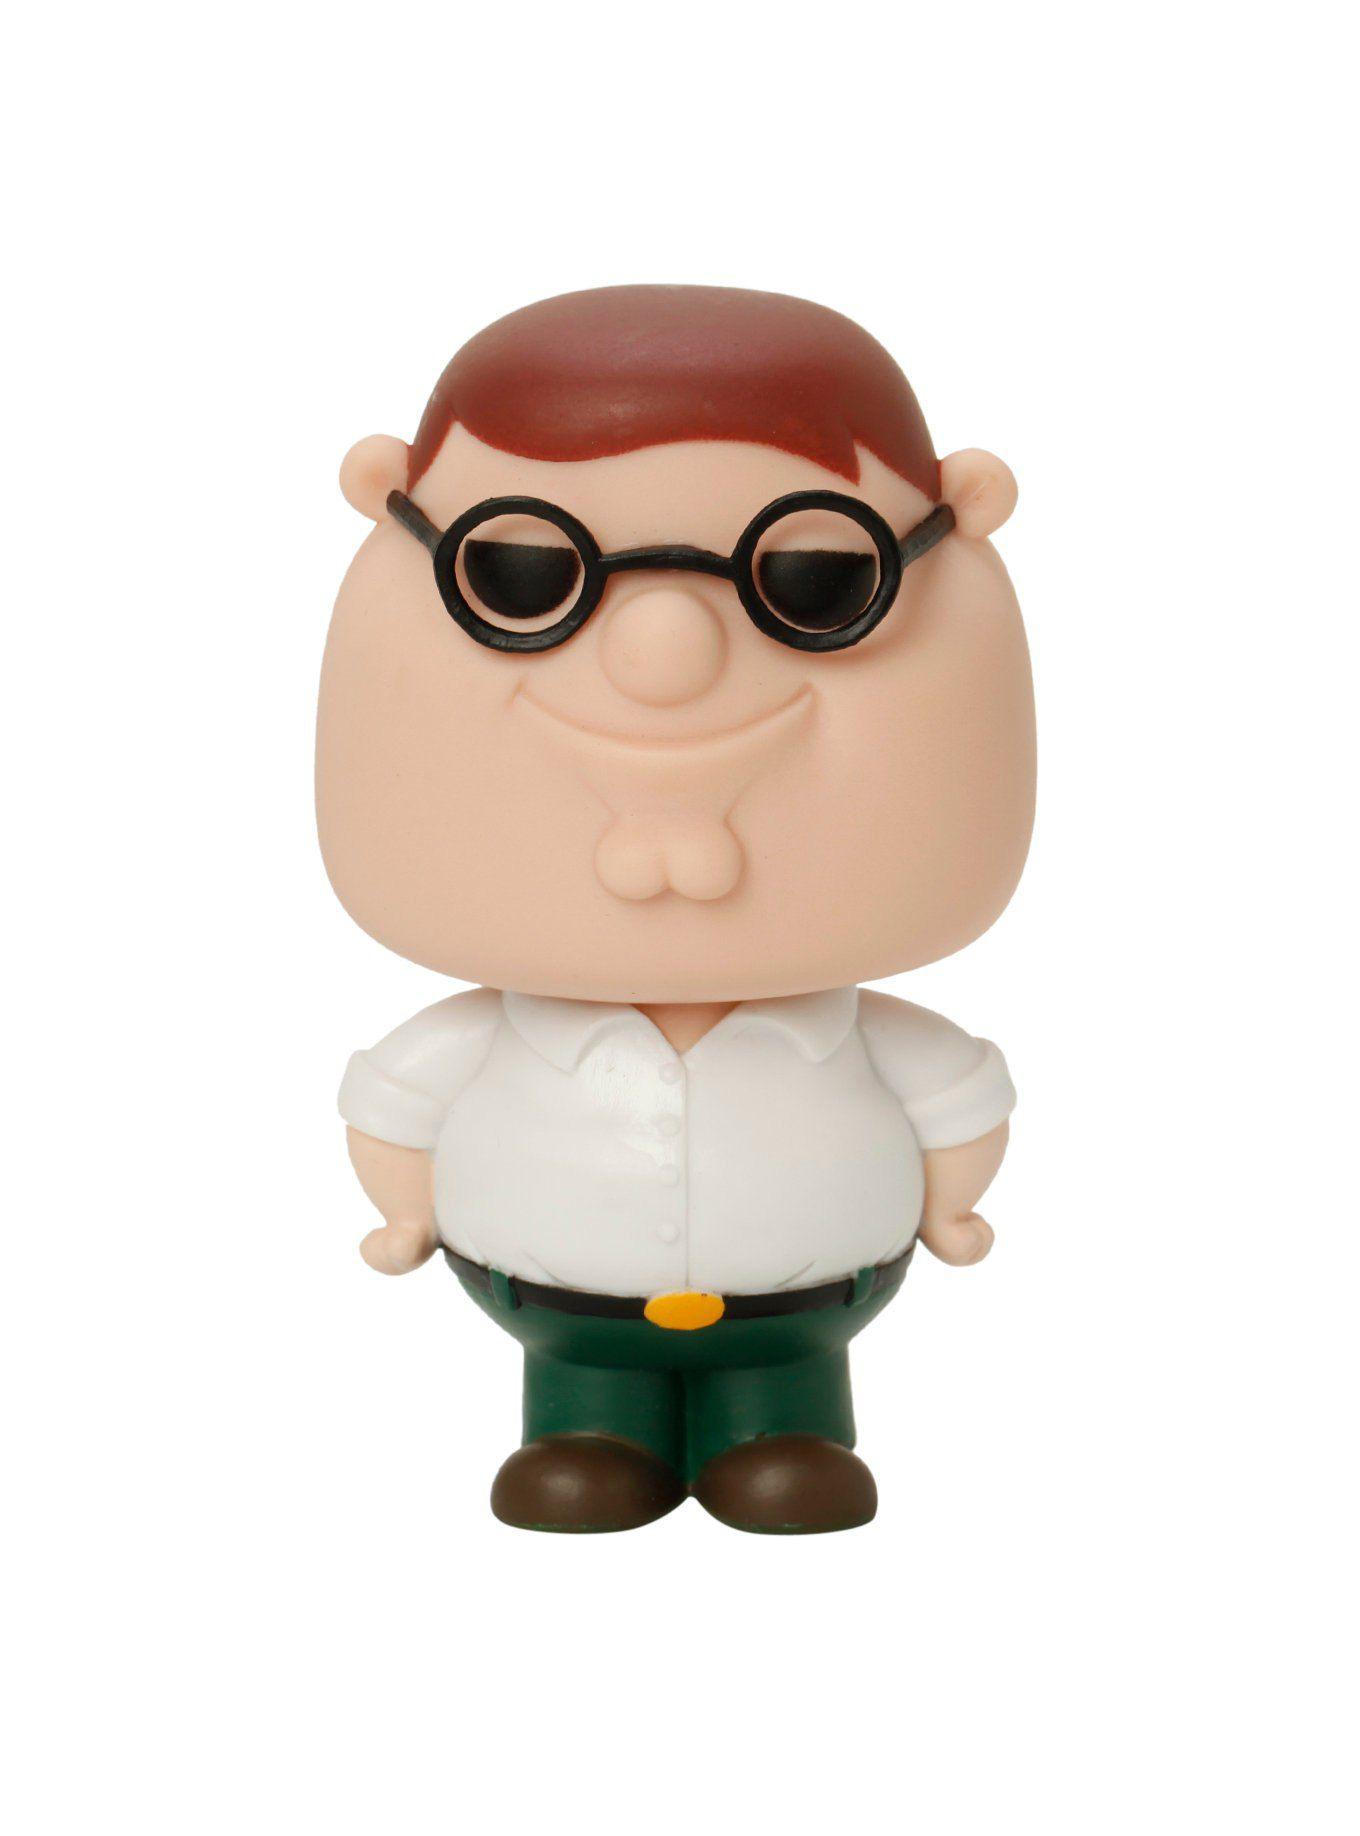 Peter #31 - Family Guy - Funko Pop! Animation